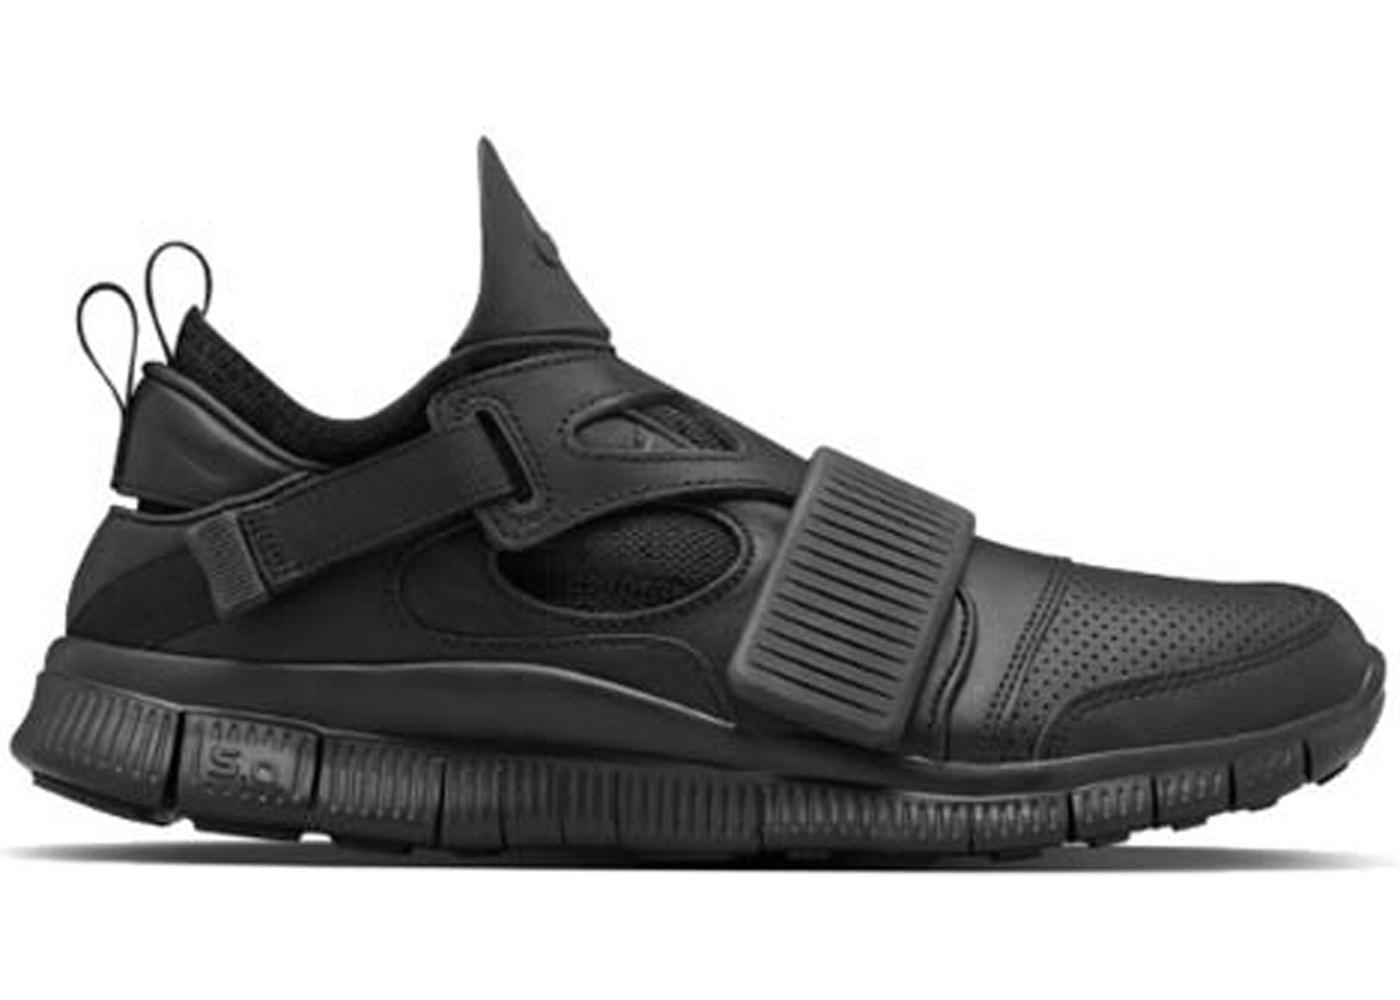 new style 98502 28ee0 Nike Free Huarache Carnivore Black - 801759-001